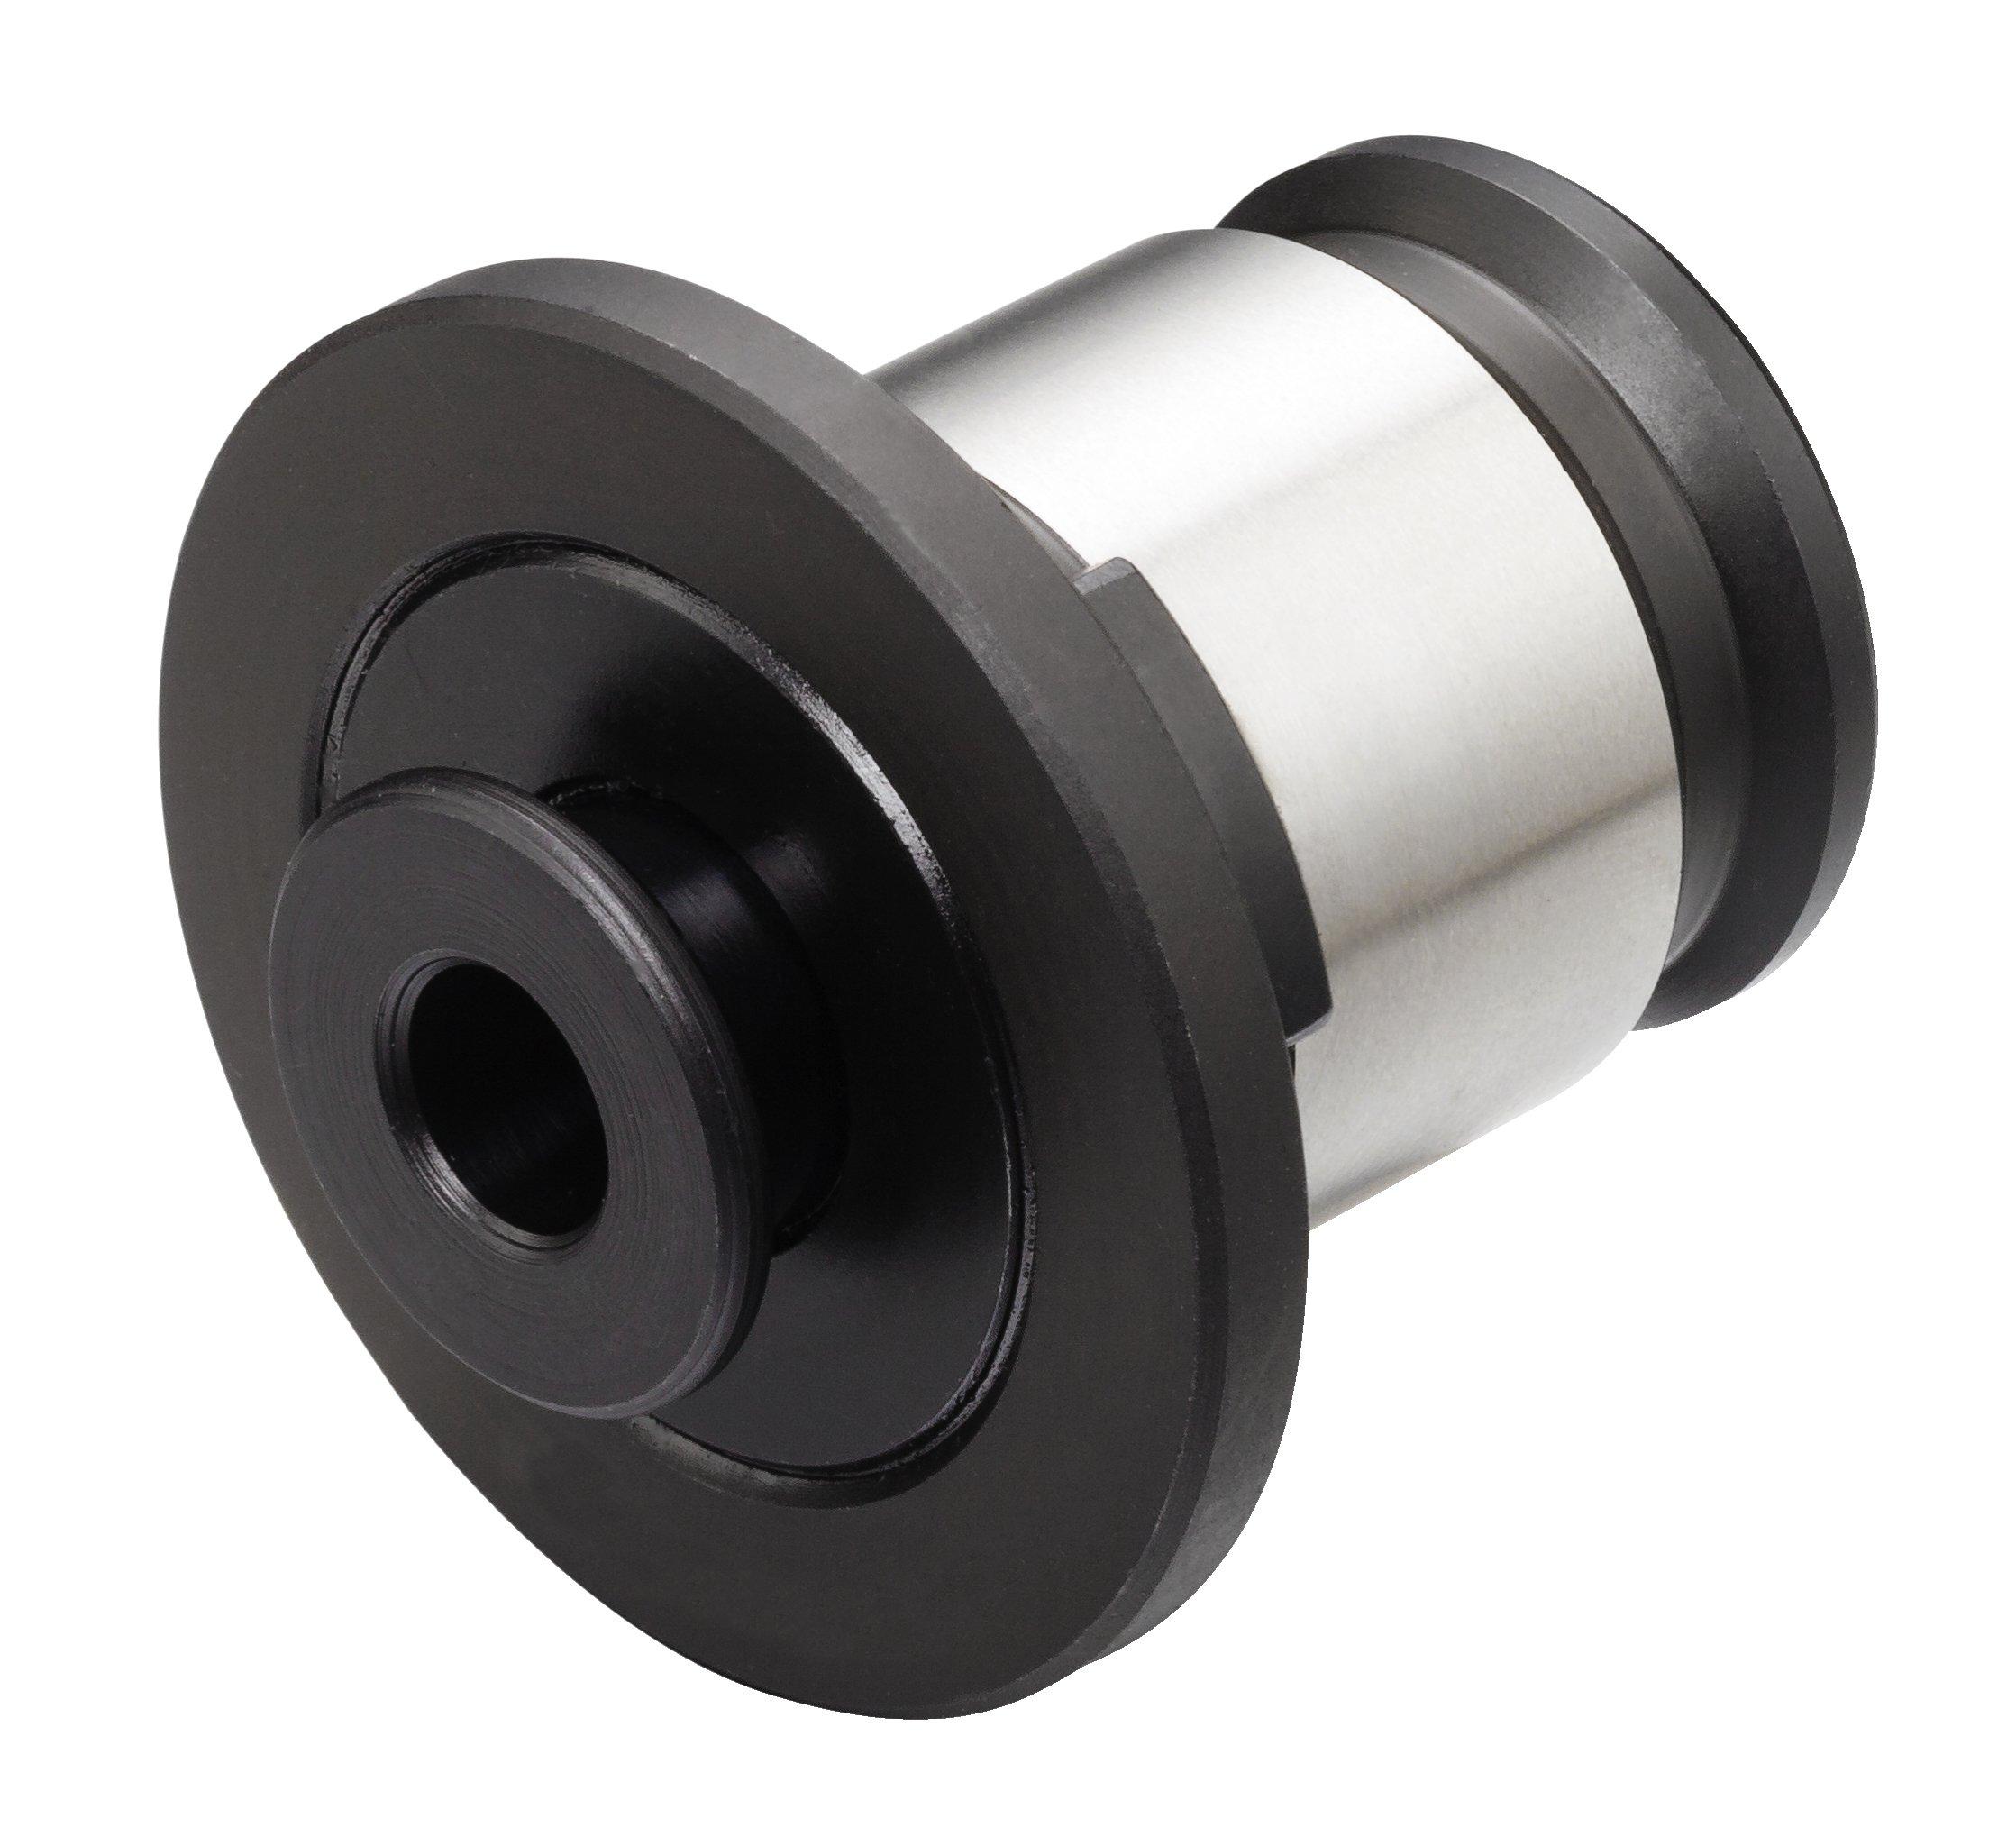 Sandvik Coromant 393.03-SE2 D120X090 Quick Change Tap Adaptor, 12 mm Diameter x 9 mm Shank Width